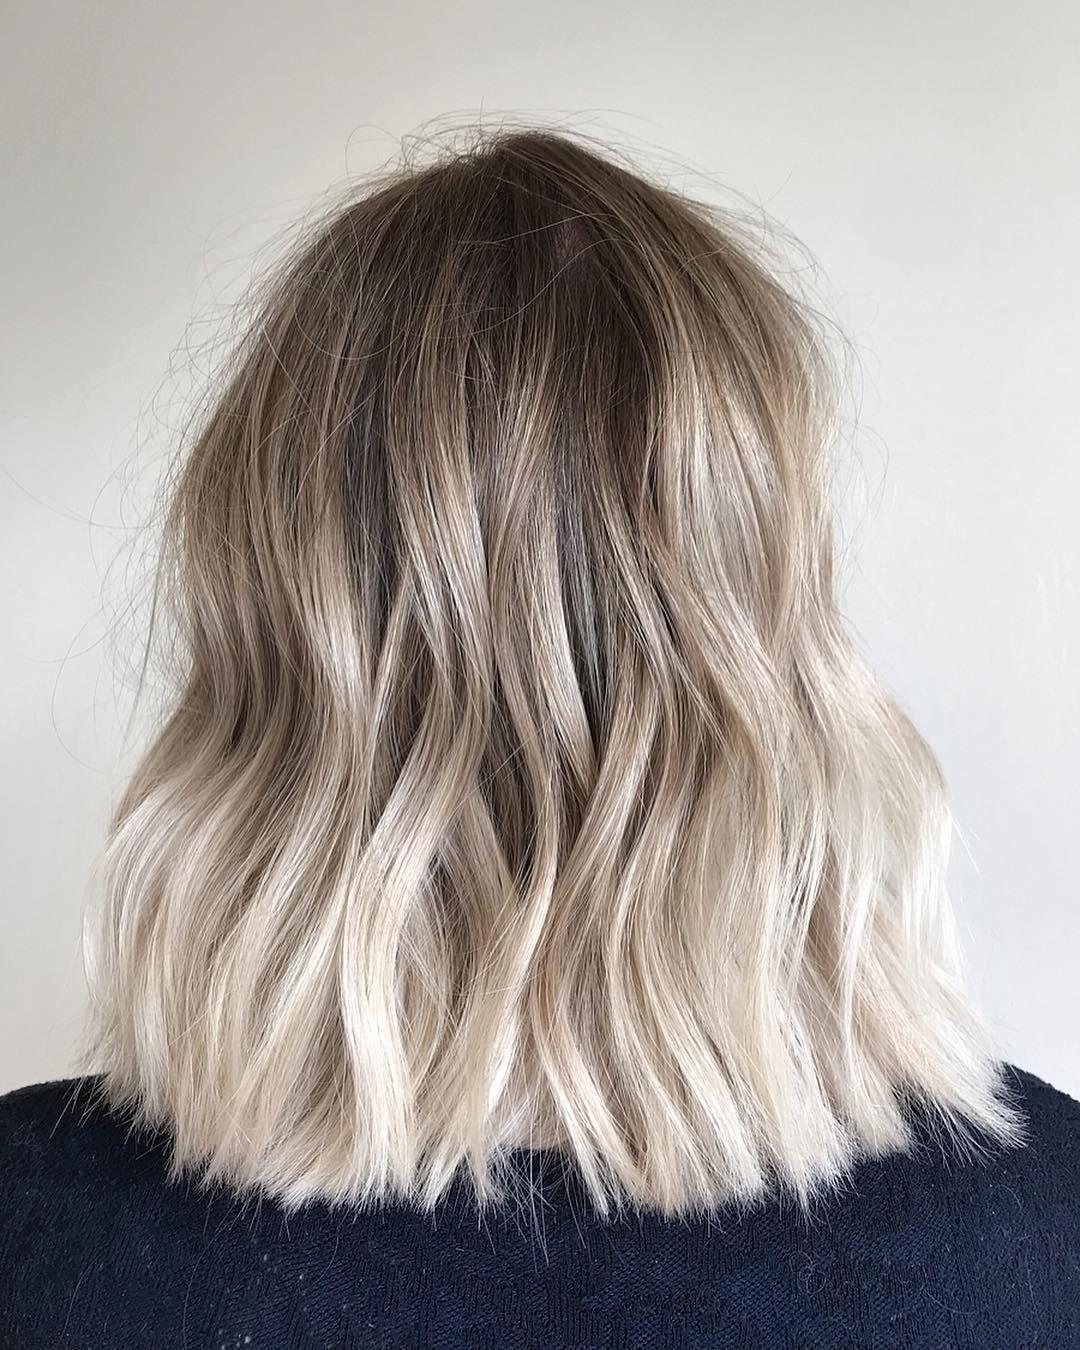 Caitlin Adli Kullanicinin Blonde Panosundaki Pin Kalin Saclar Sarisin Sac Modelleri Sari Balyaj